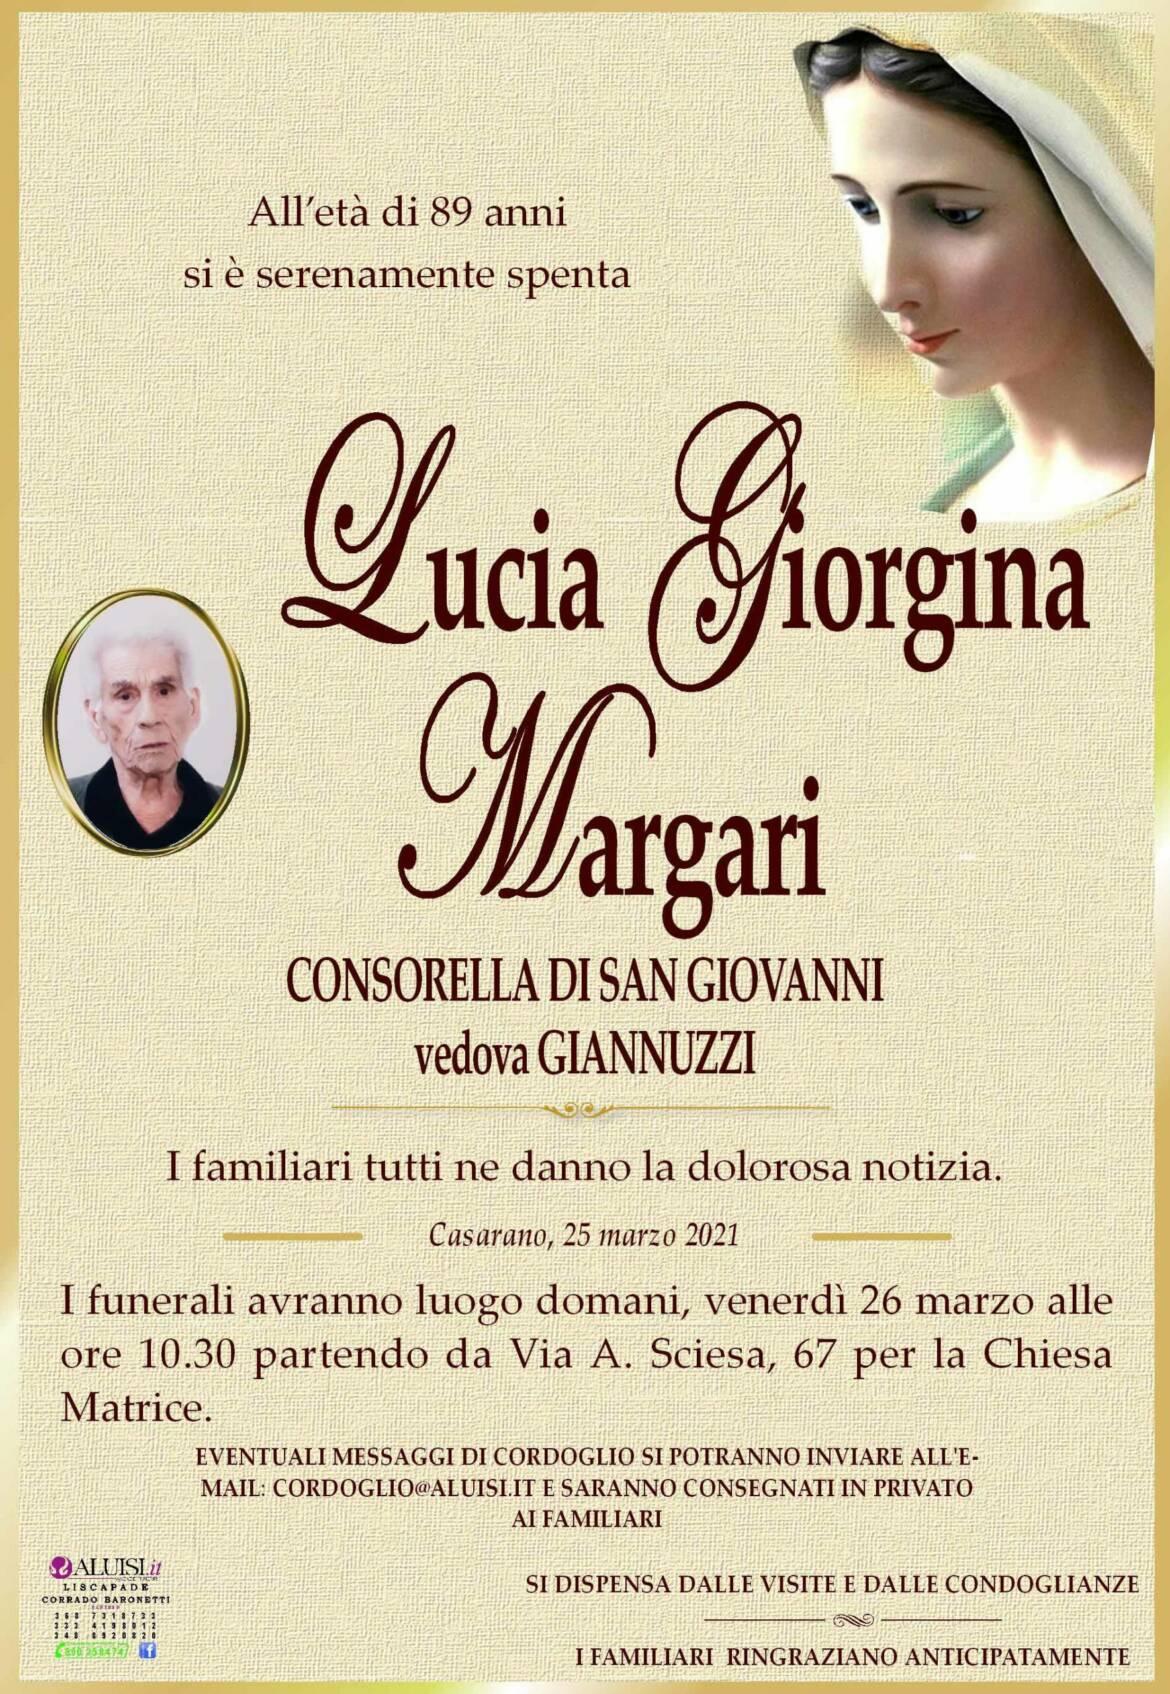 annuncio-lucia-giorgina-casarano-scaled.jpg